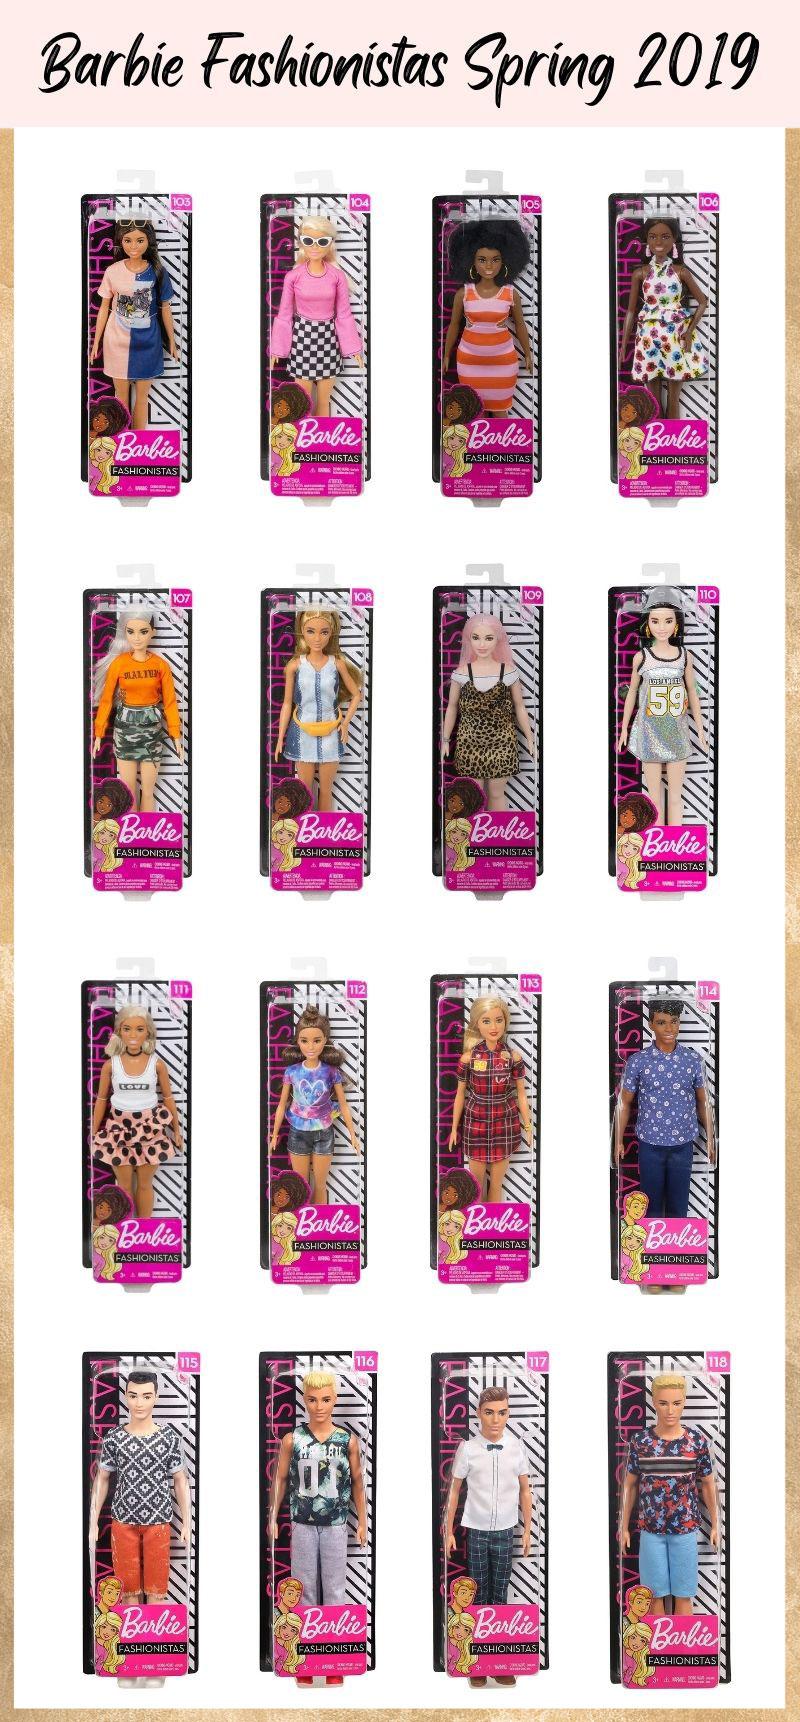 Barbie Fashionistas Spring 2019.